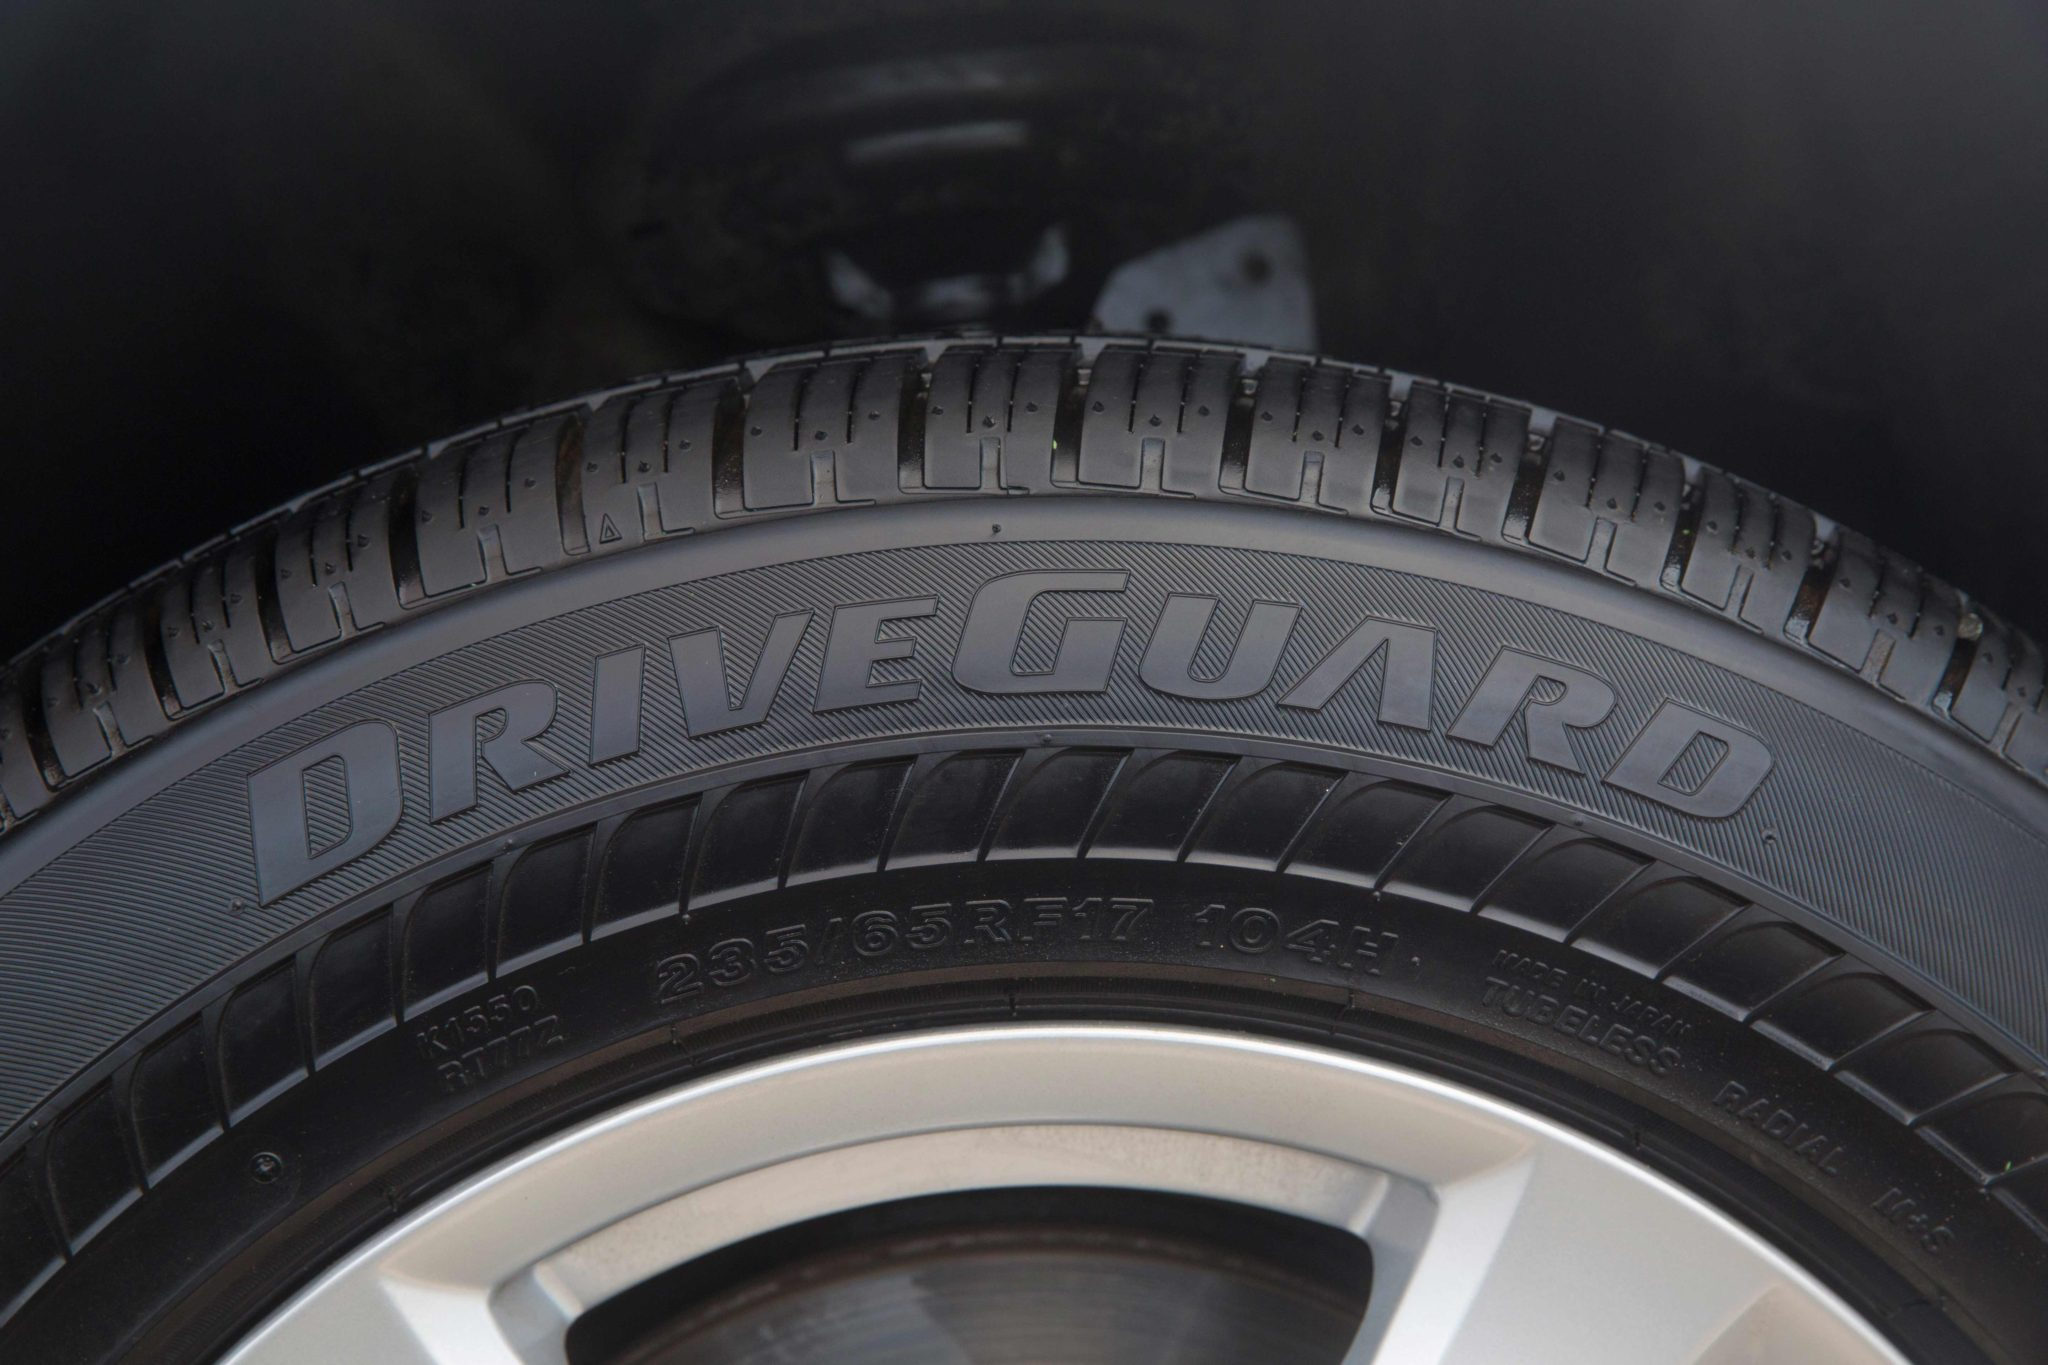 Bridgestone DriveGuard tire